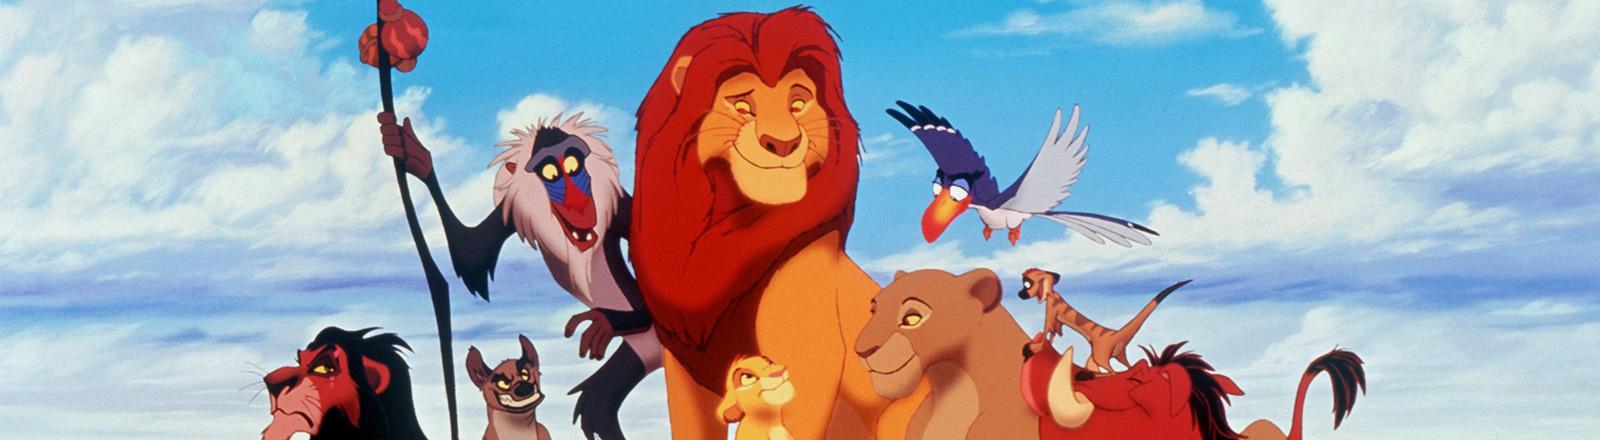 Szene aus dem Disney-Film König der Löwen